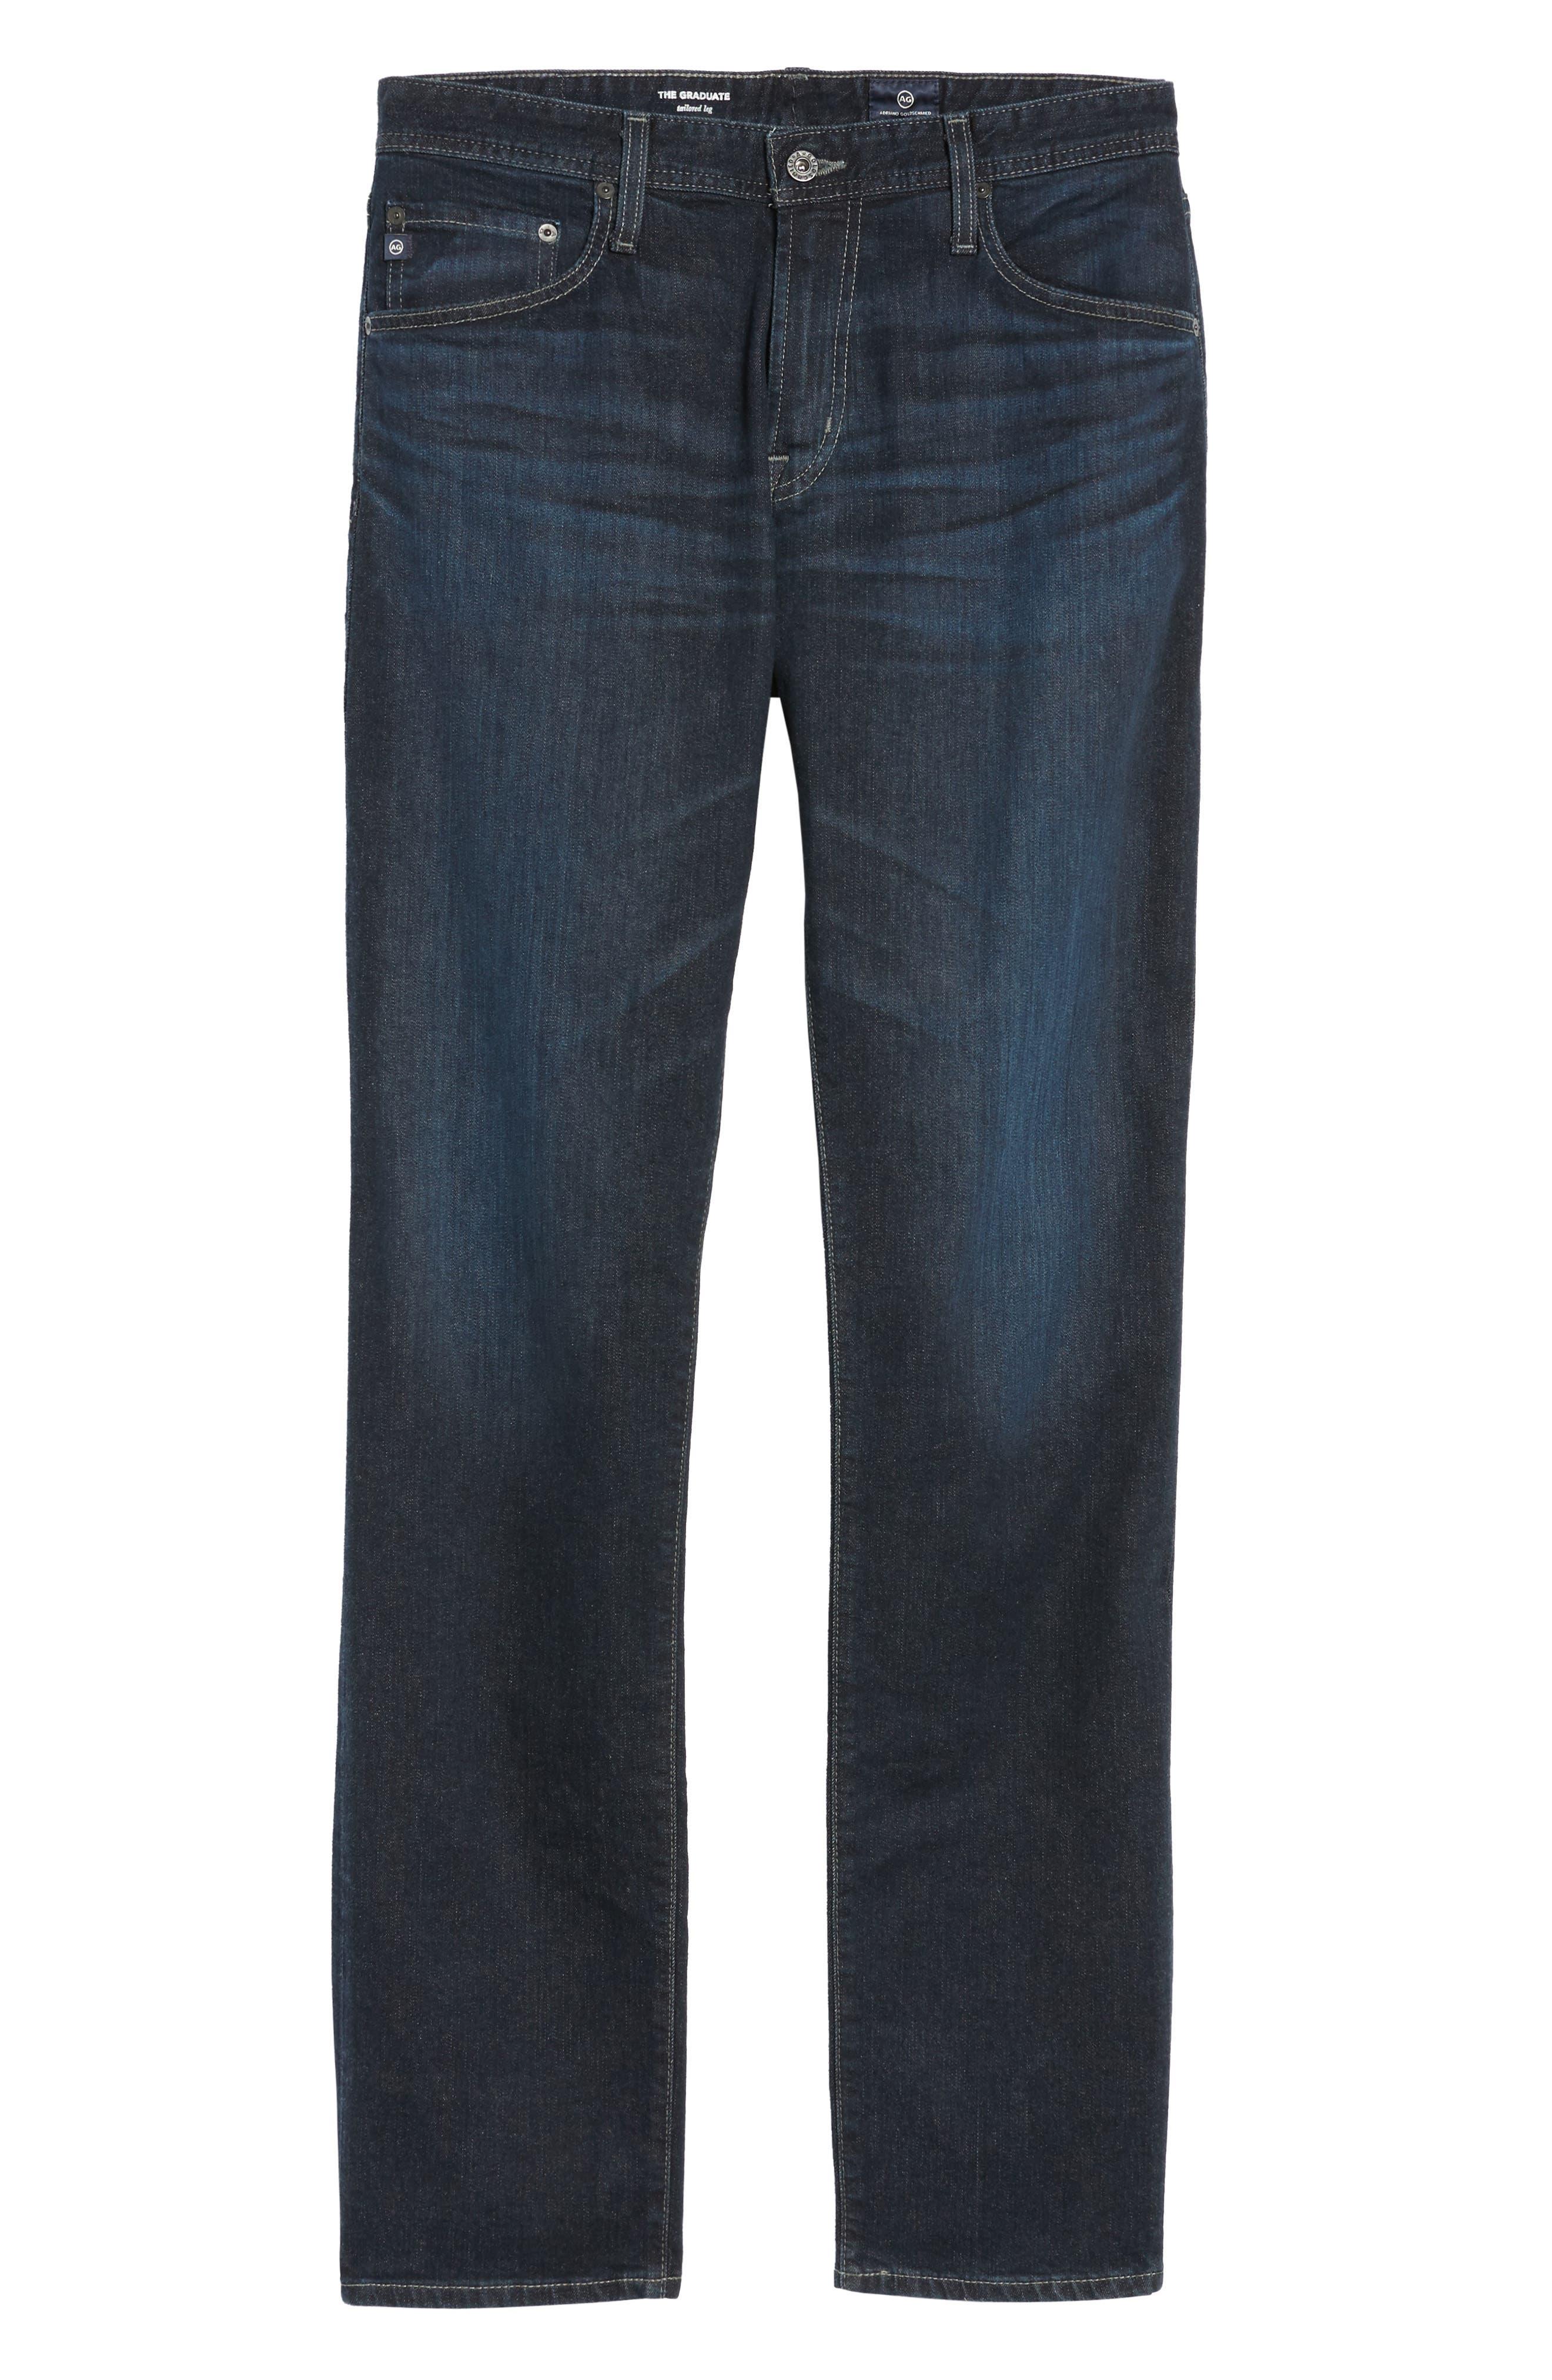 Graduate Slim Straight Leg Jeans,                             Alternate thumbnail 7, color,                             Rockwell